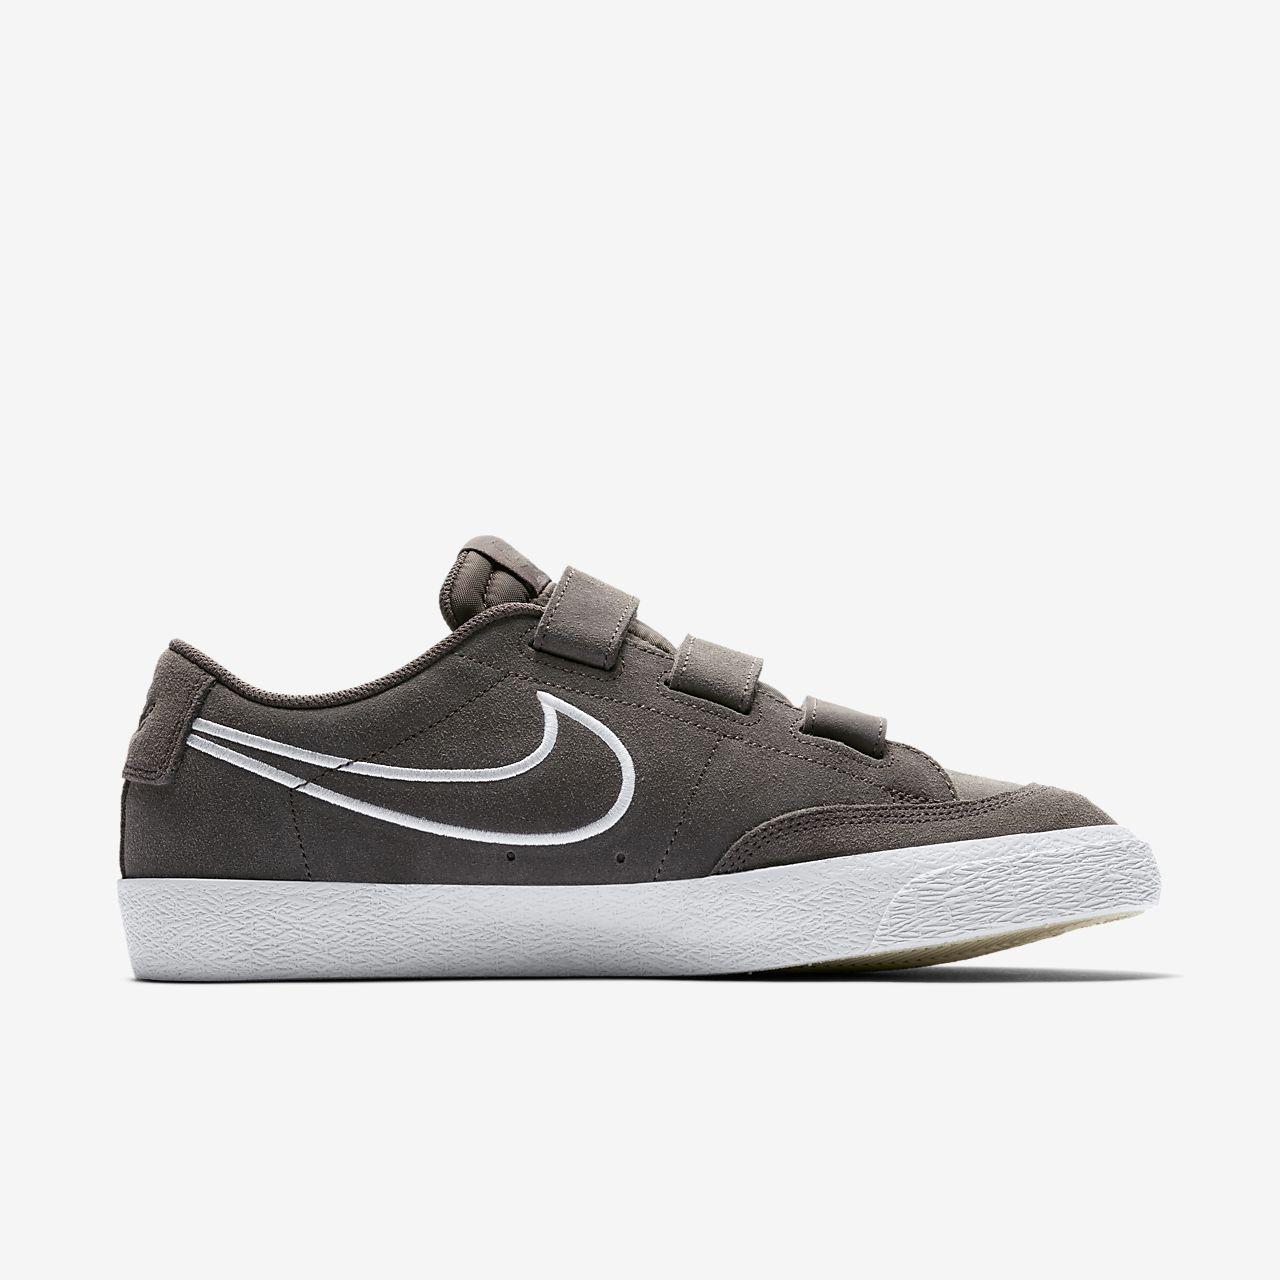 Chaussure de skateboard Nike SB Zoom Blazer AC XT pour Homme